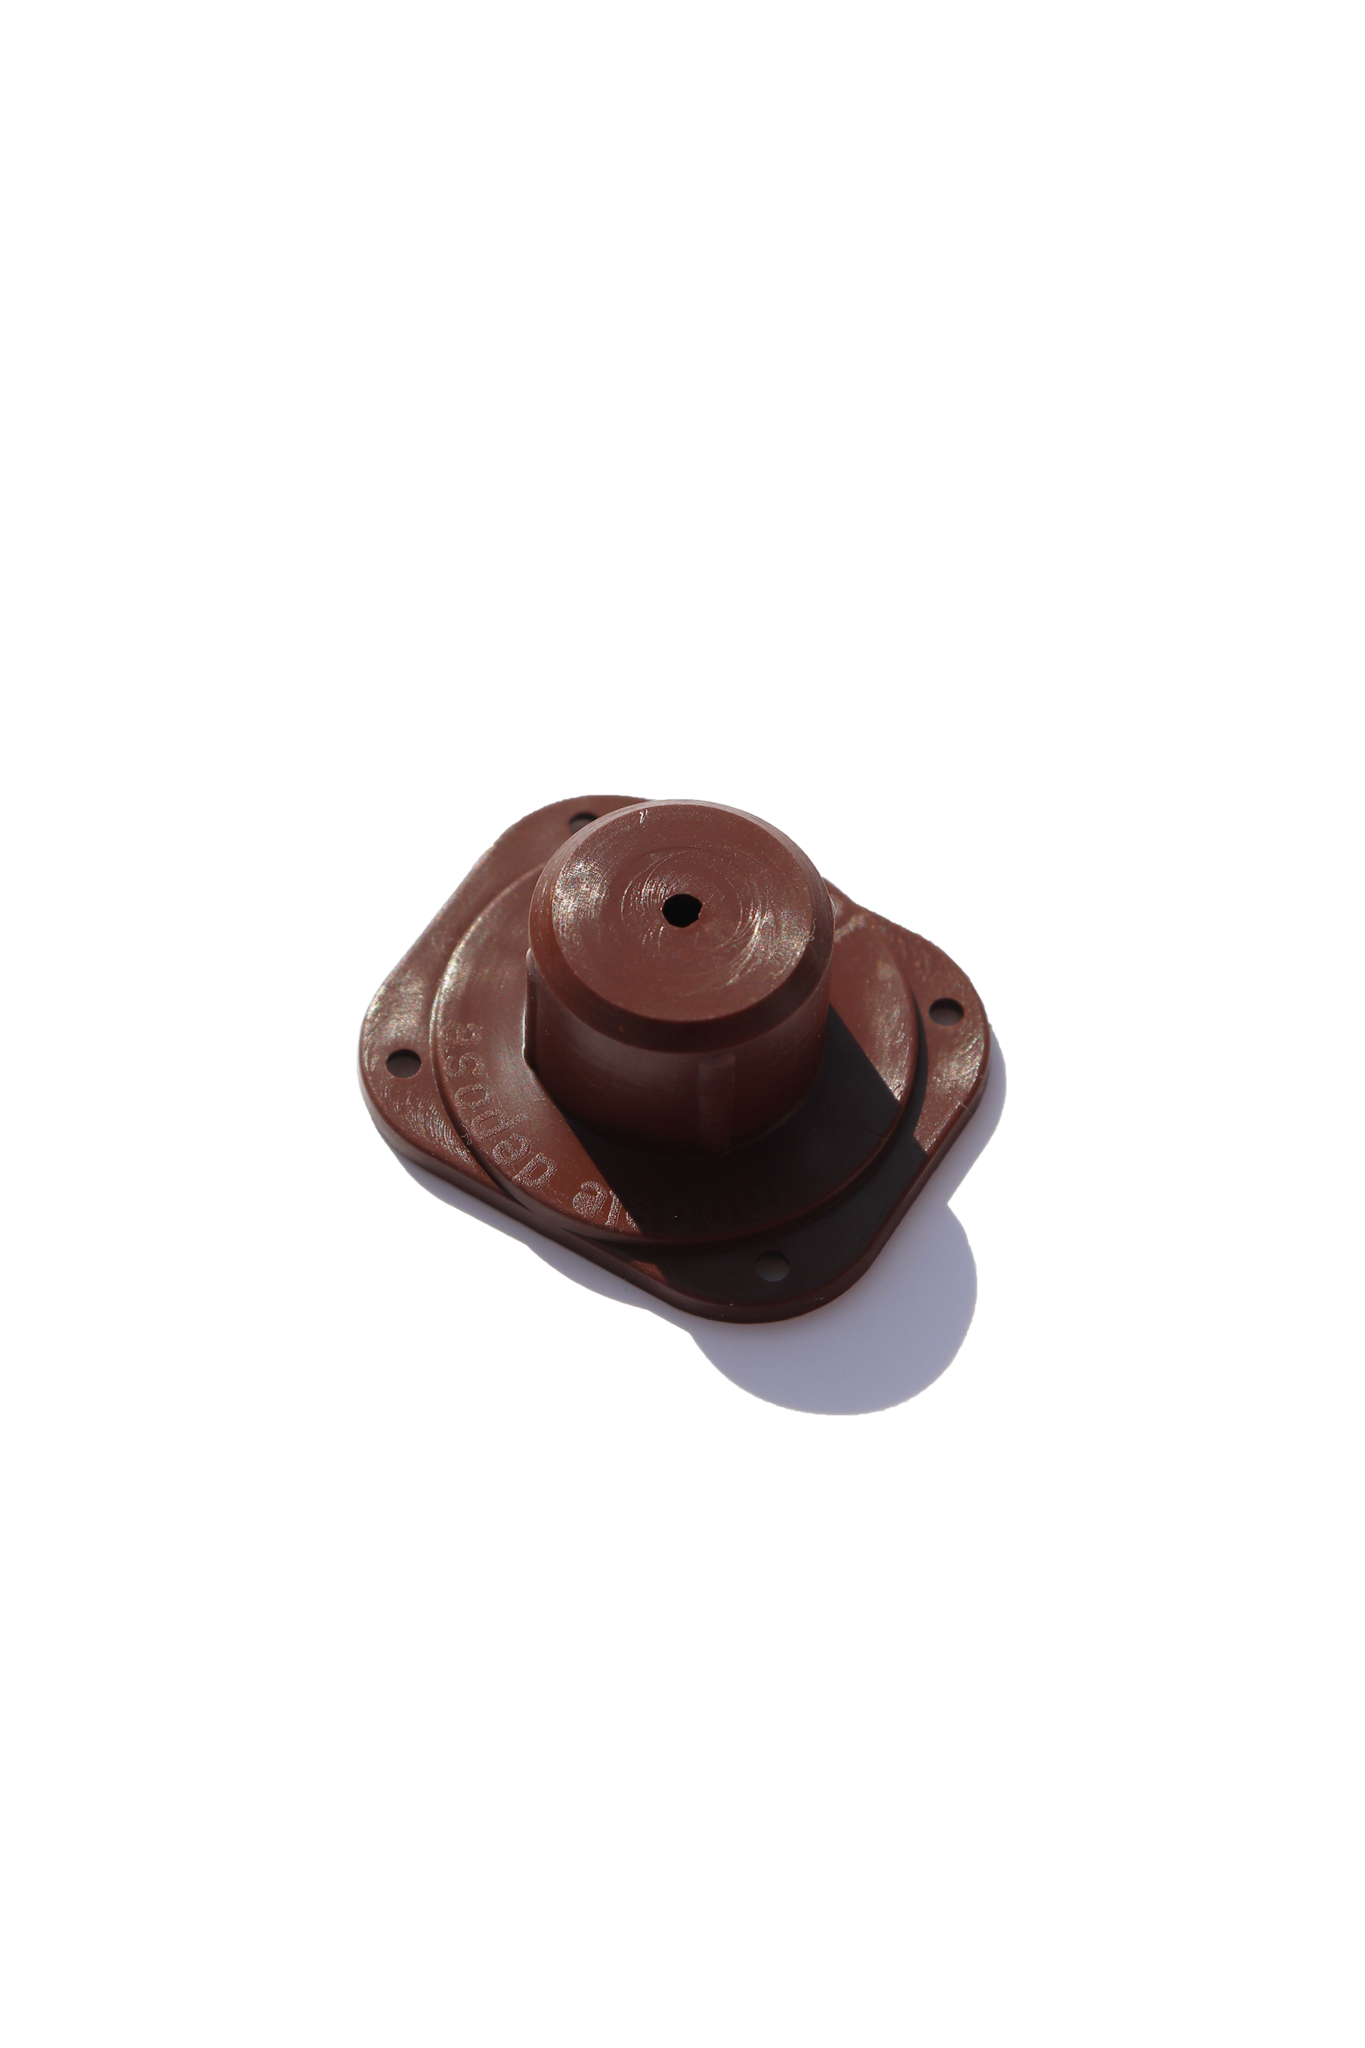 Bruine nicot bevestiger (10 stuks)-2